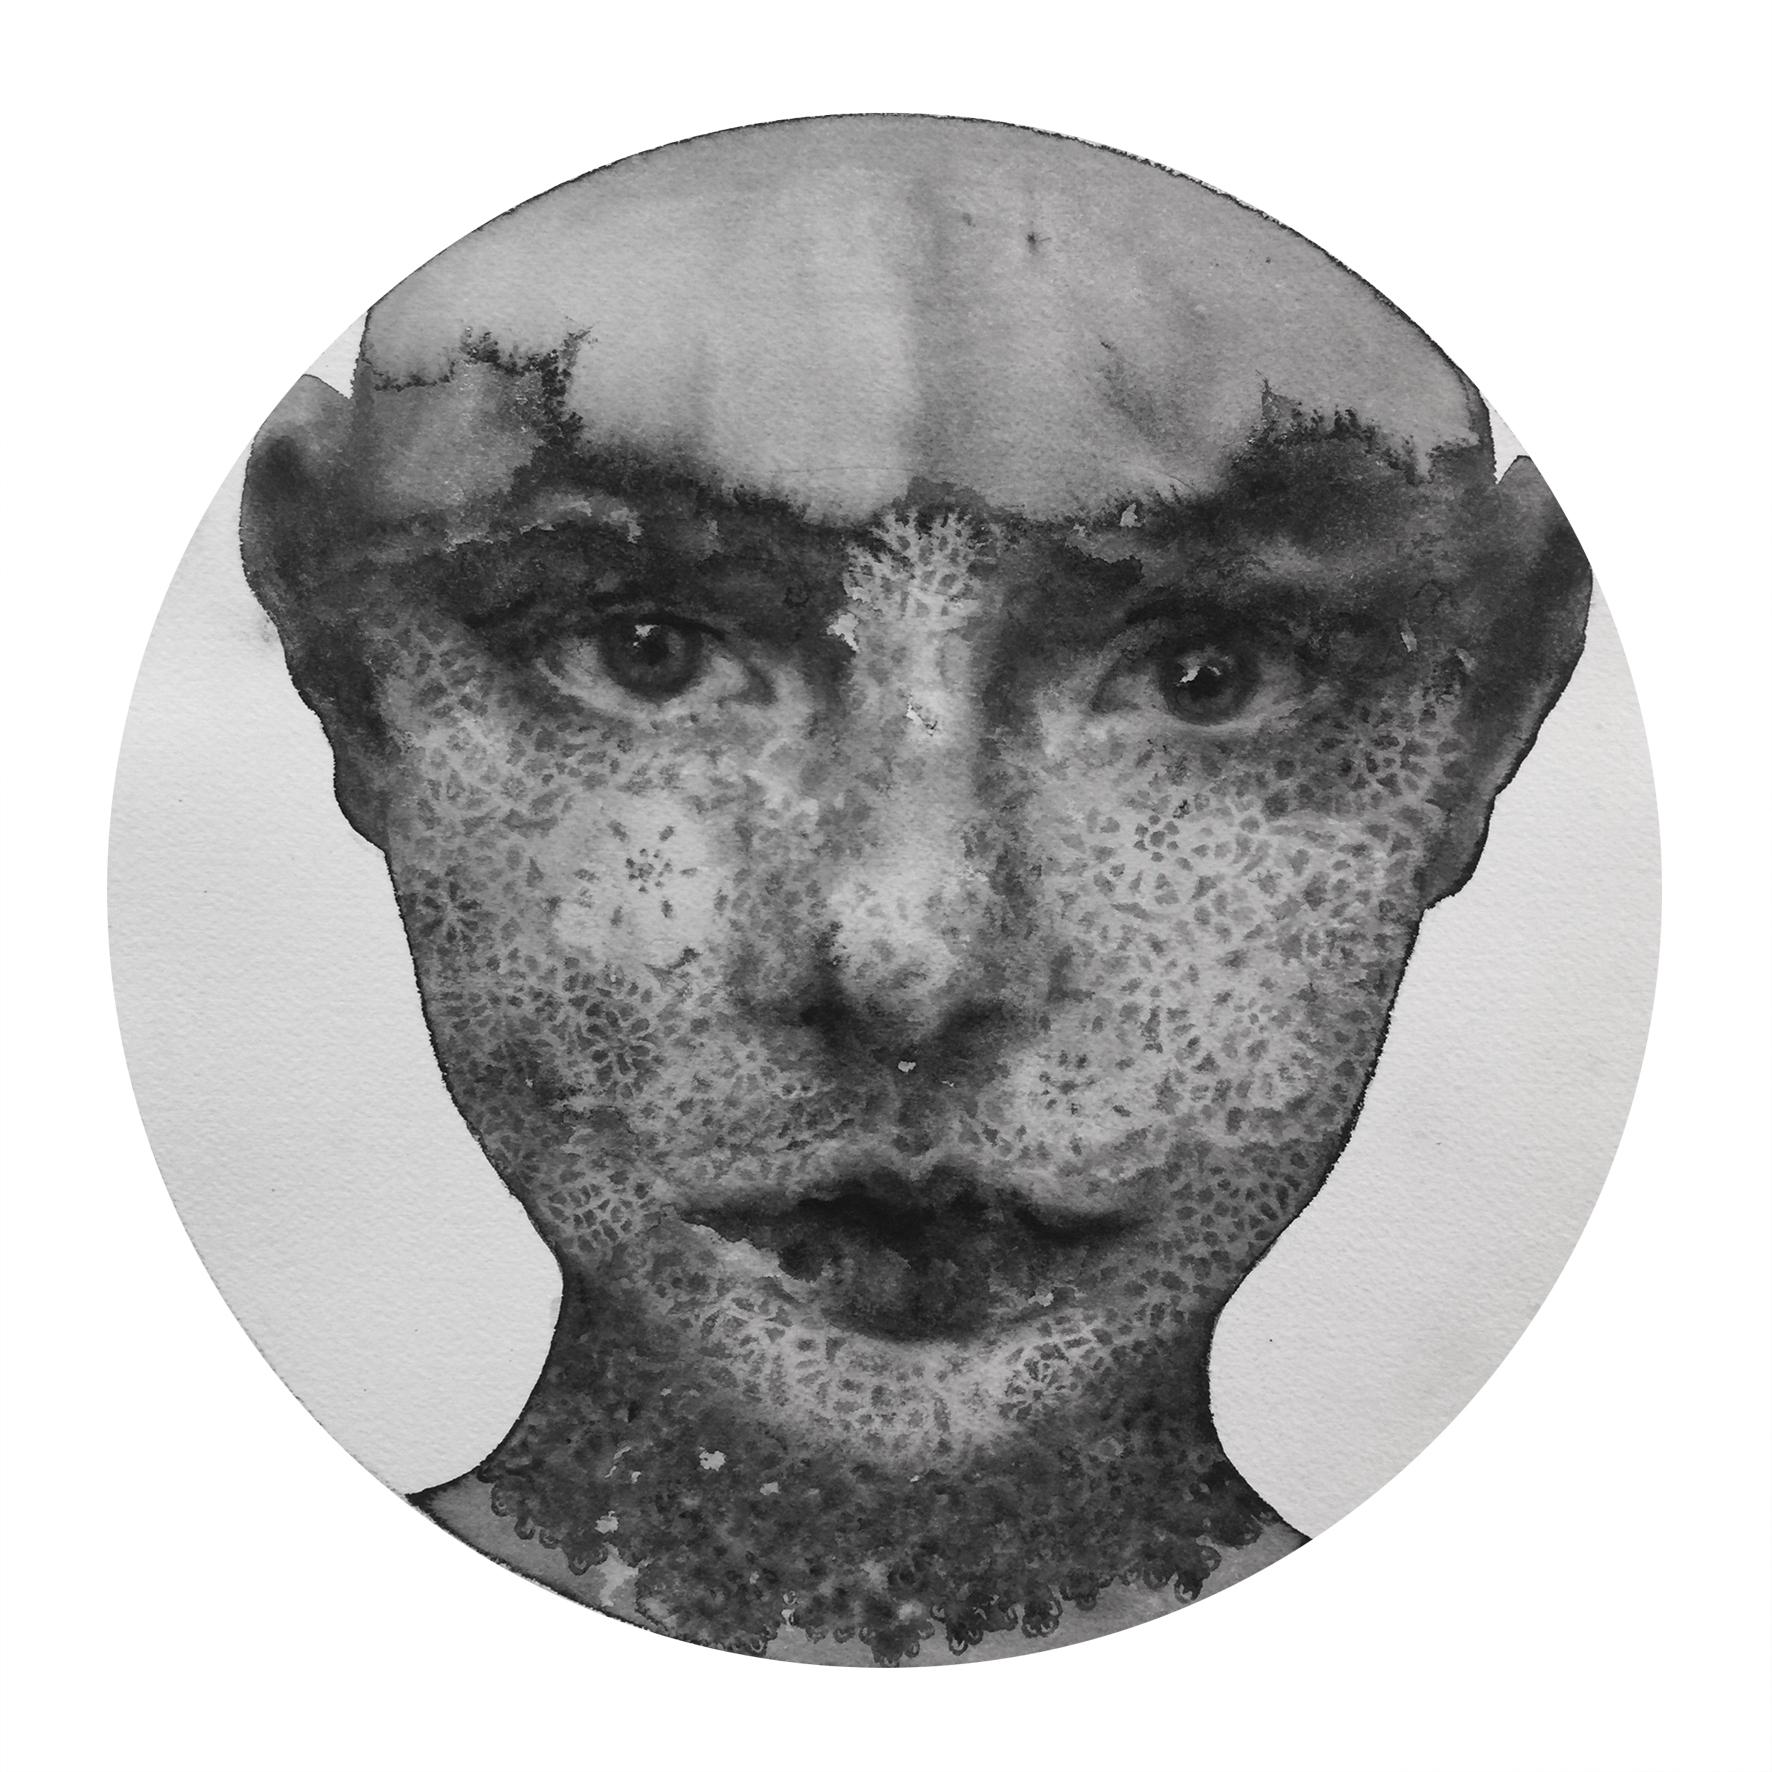 Reflection #27 (Contemporary Chinese Artist Shanlin Ye at Jim Kempner Fine Art)